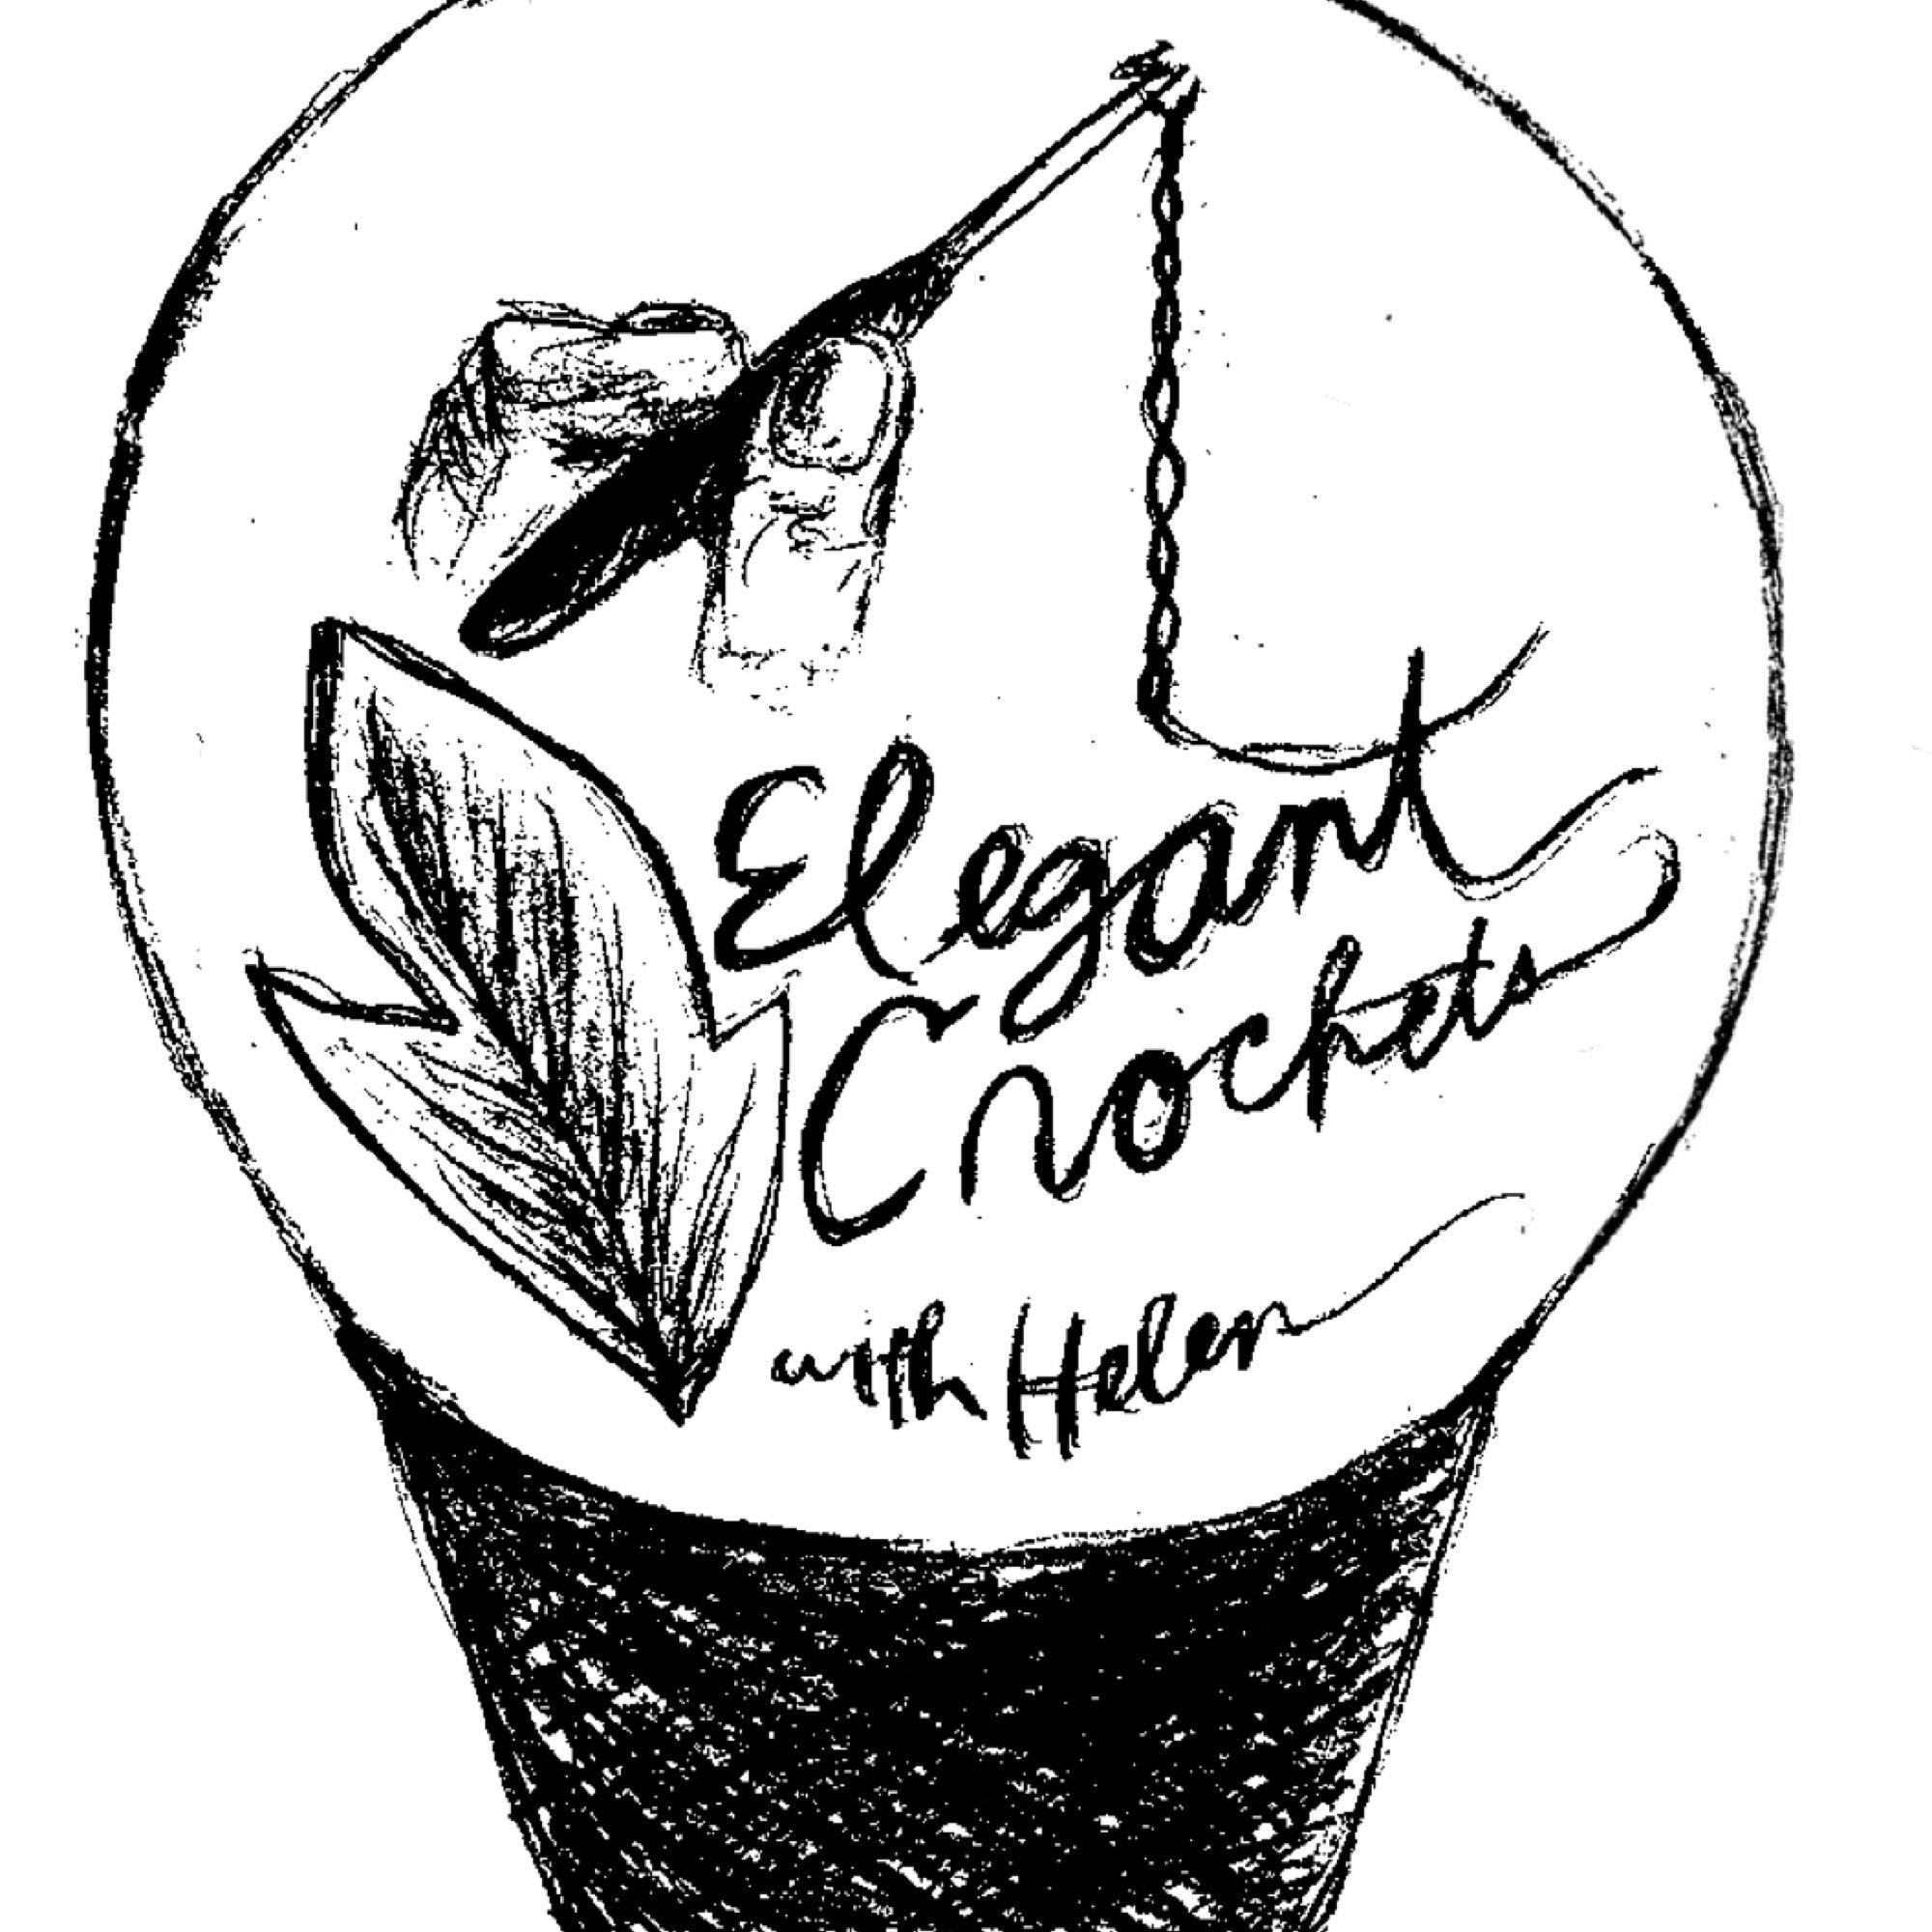 bohemian wrap top crochet crop wrap top festival top etsy Hay Skirt elegantcrochets